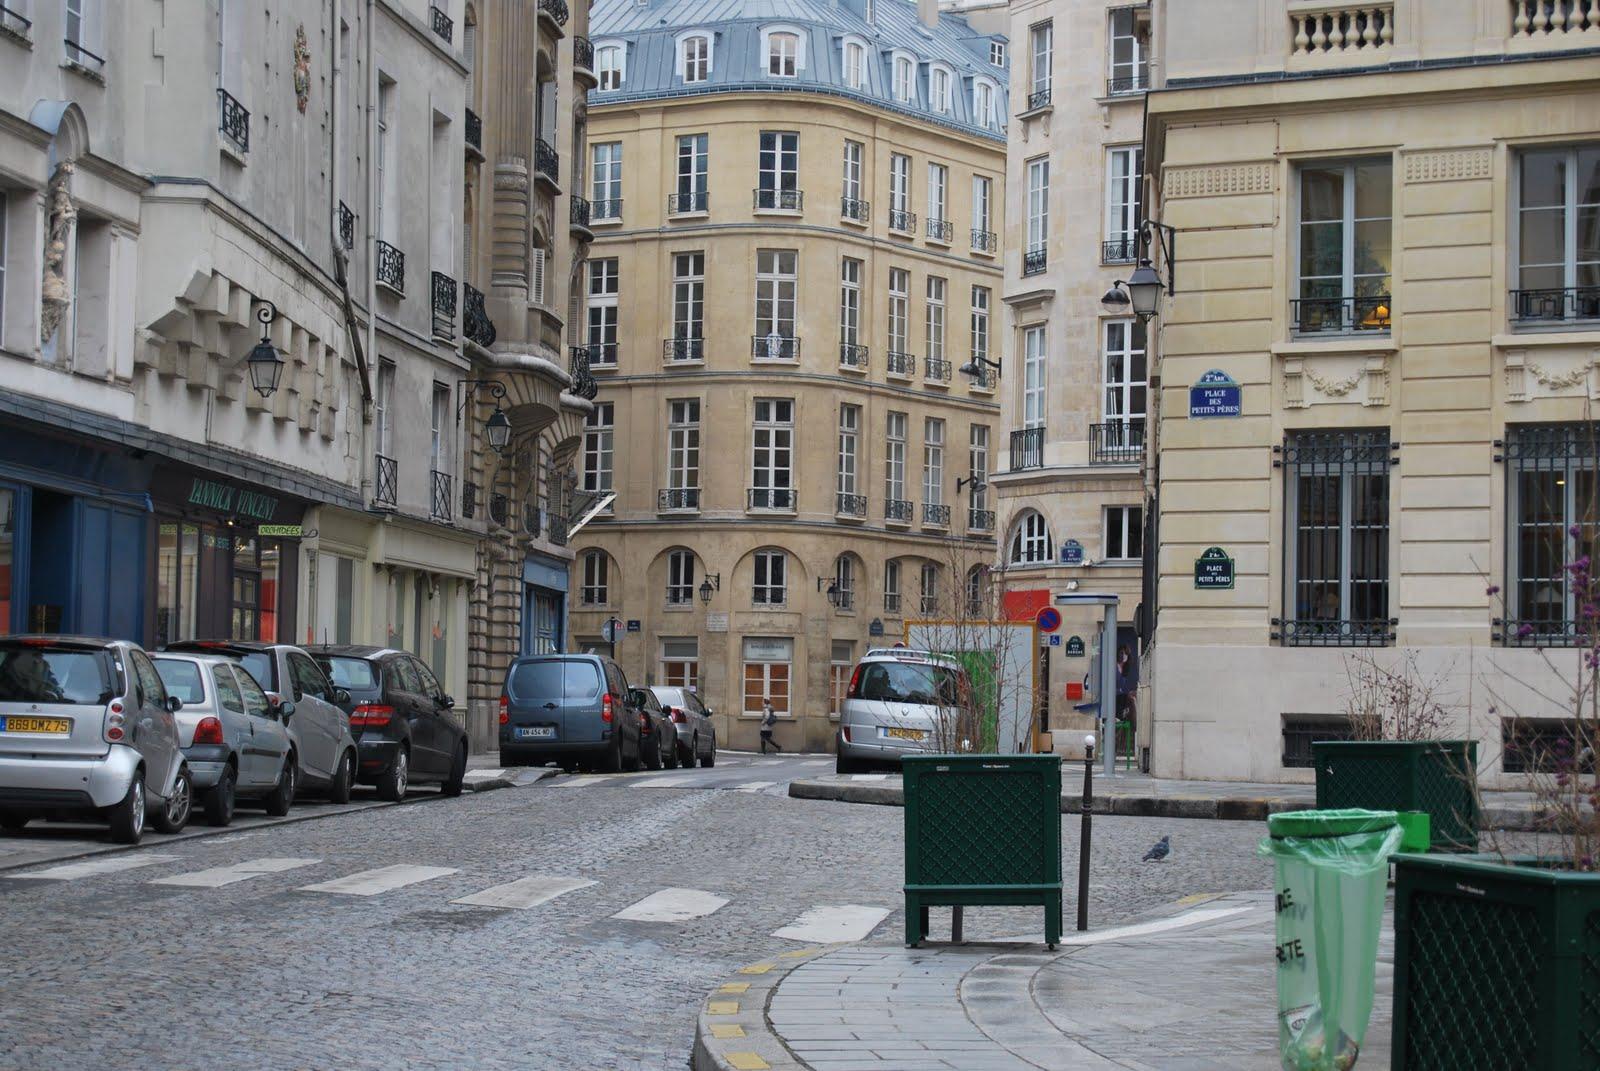 rue pestalozzi le sentier paris 2 le sentier in paris 2. Black Bedroom Furniture Sets. Home Design Ideas